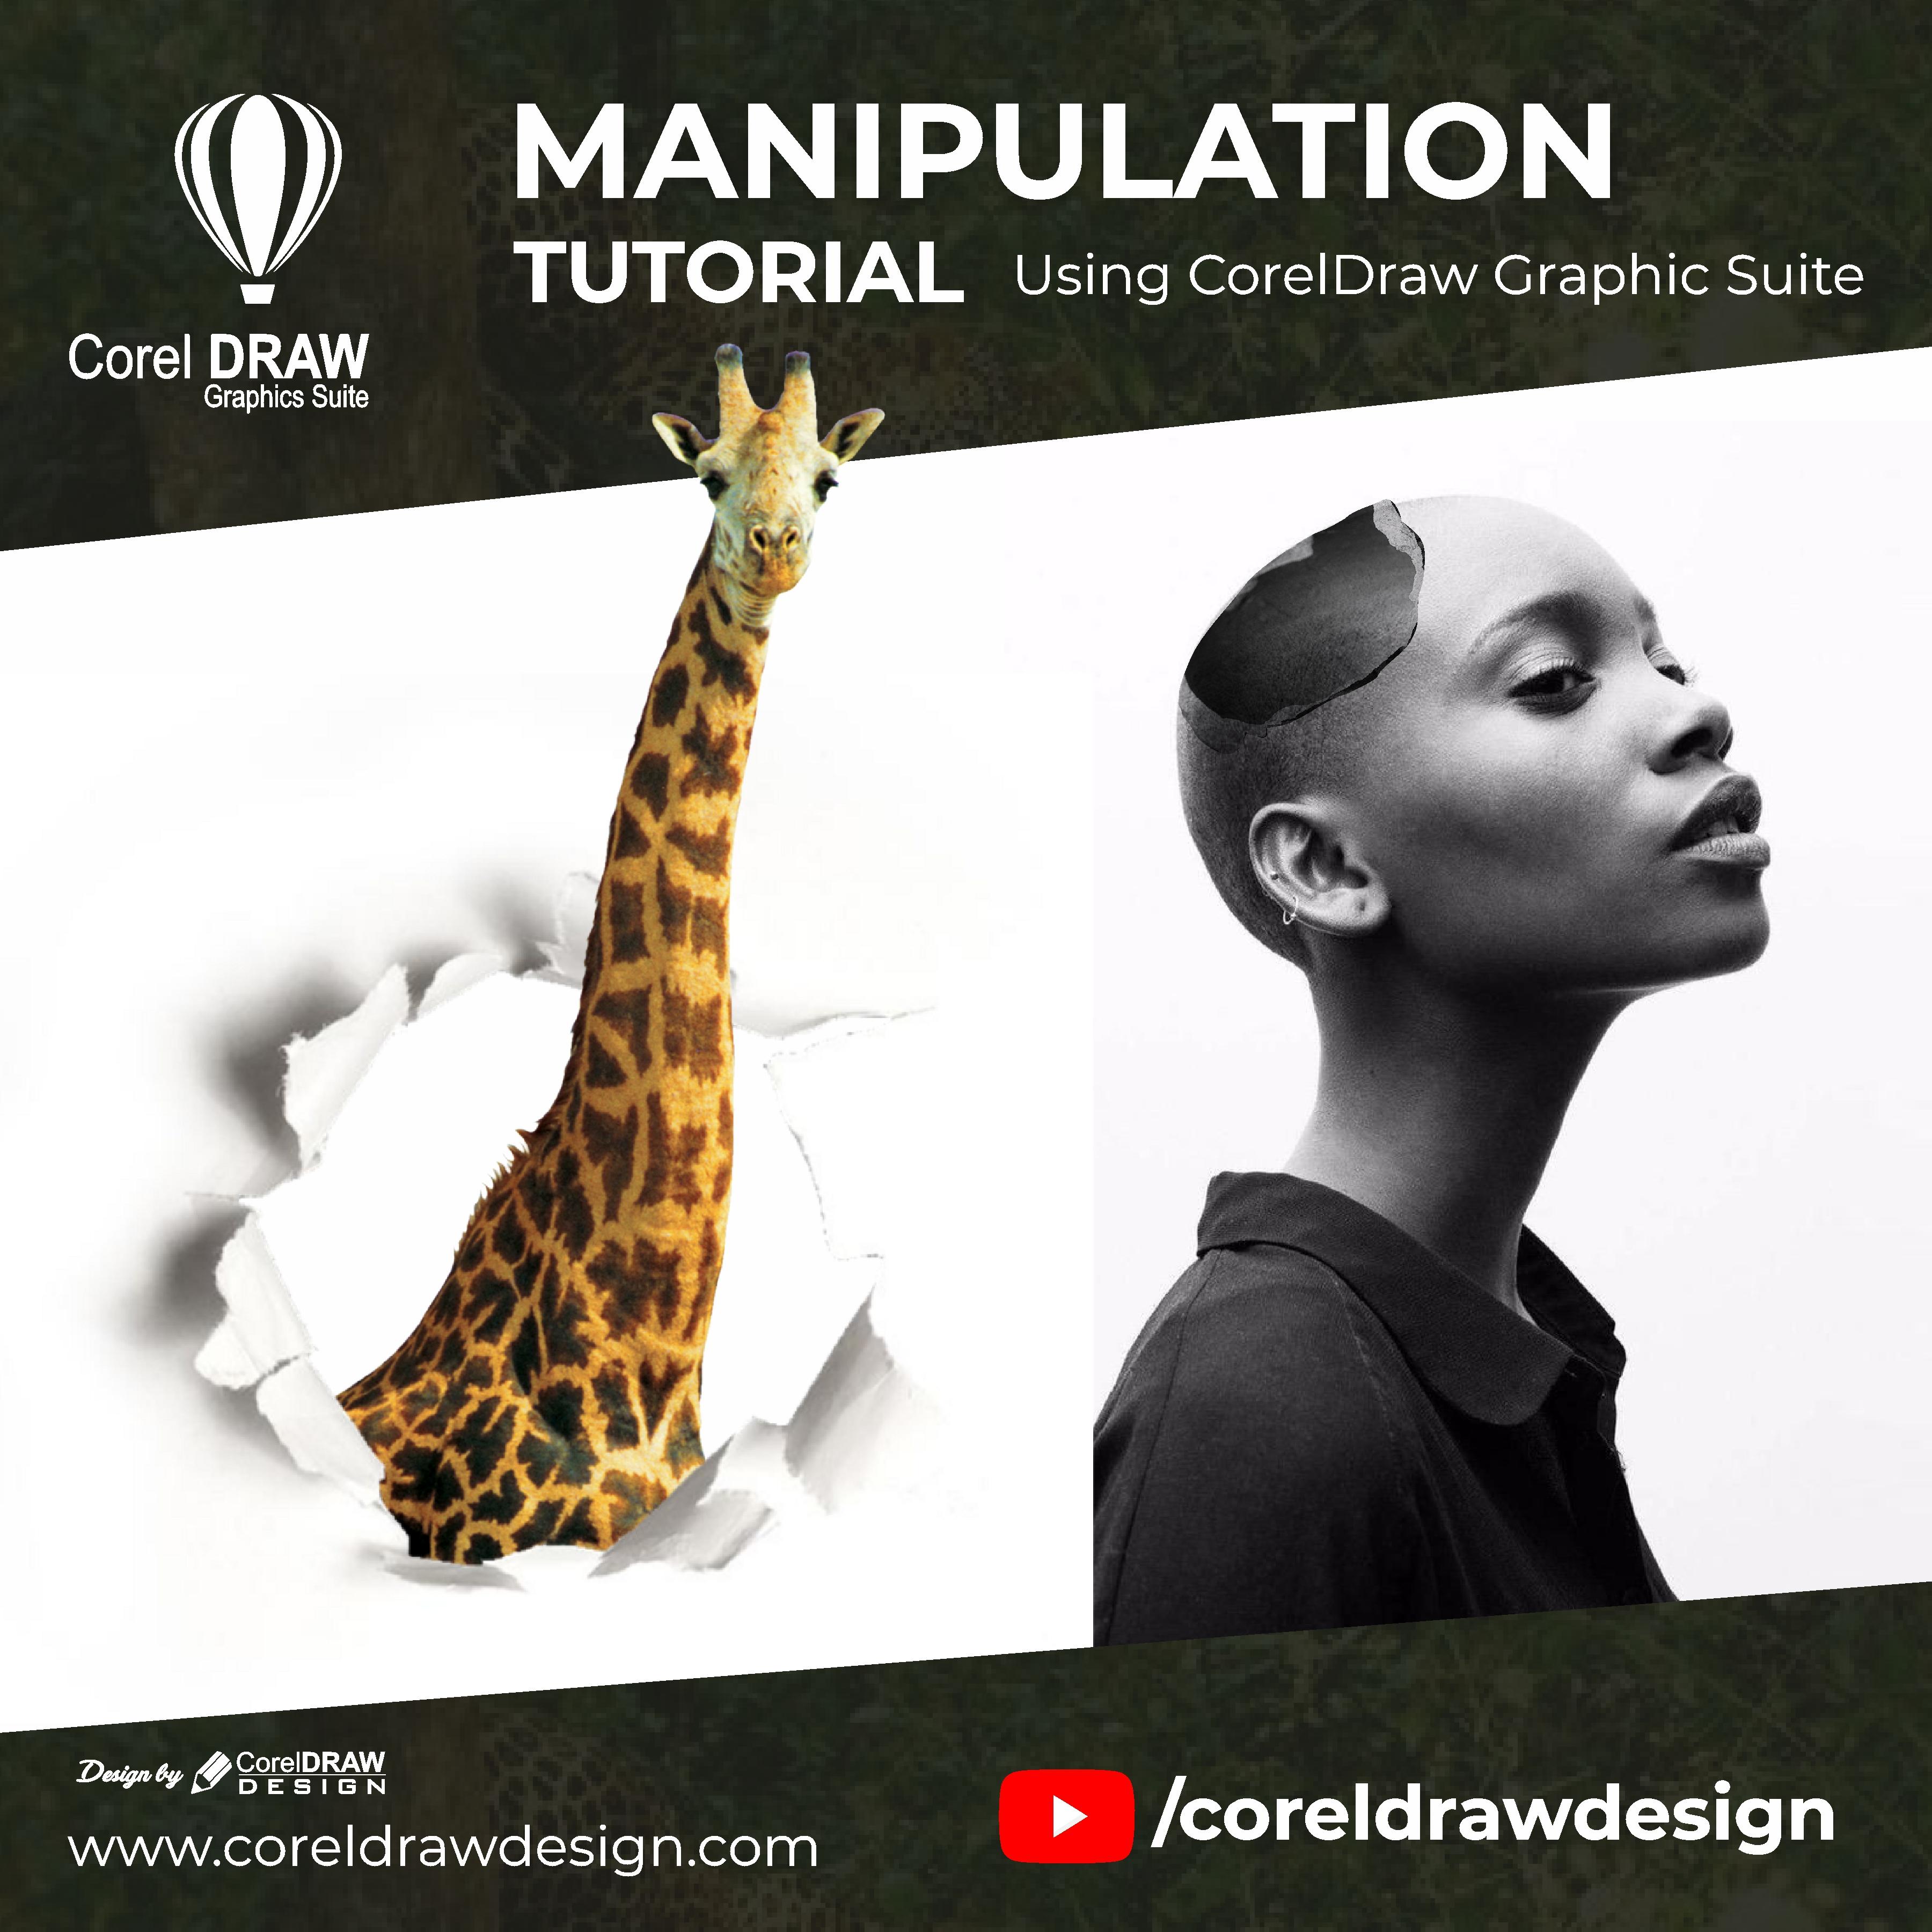 Coreldraw Photo manipulation Digital Graphics Tutorial Coreldraw for Beginners